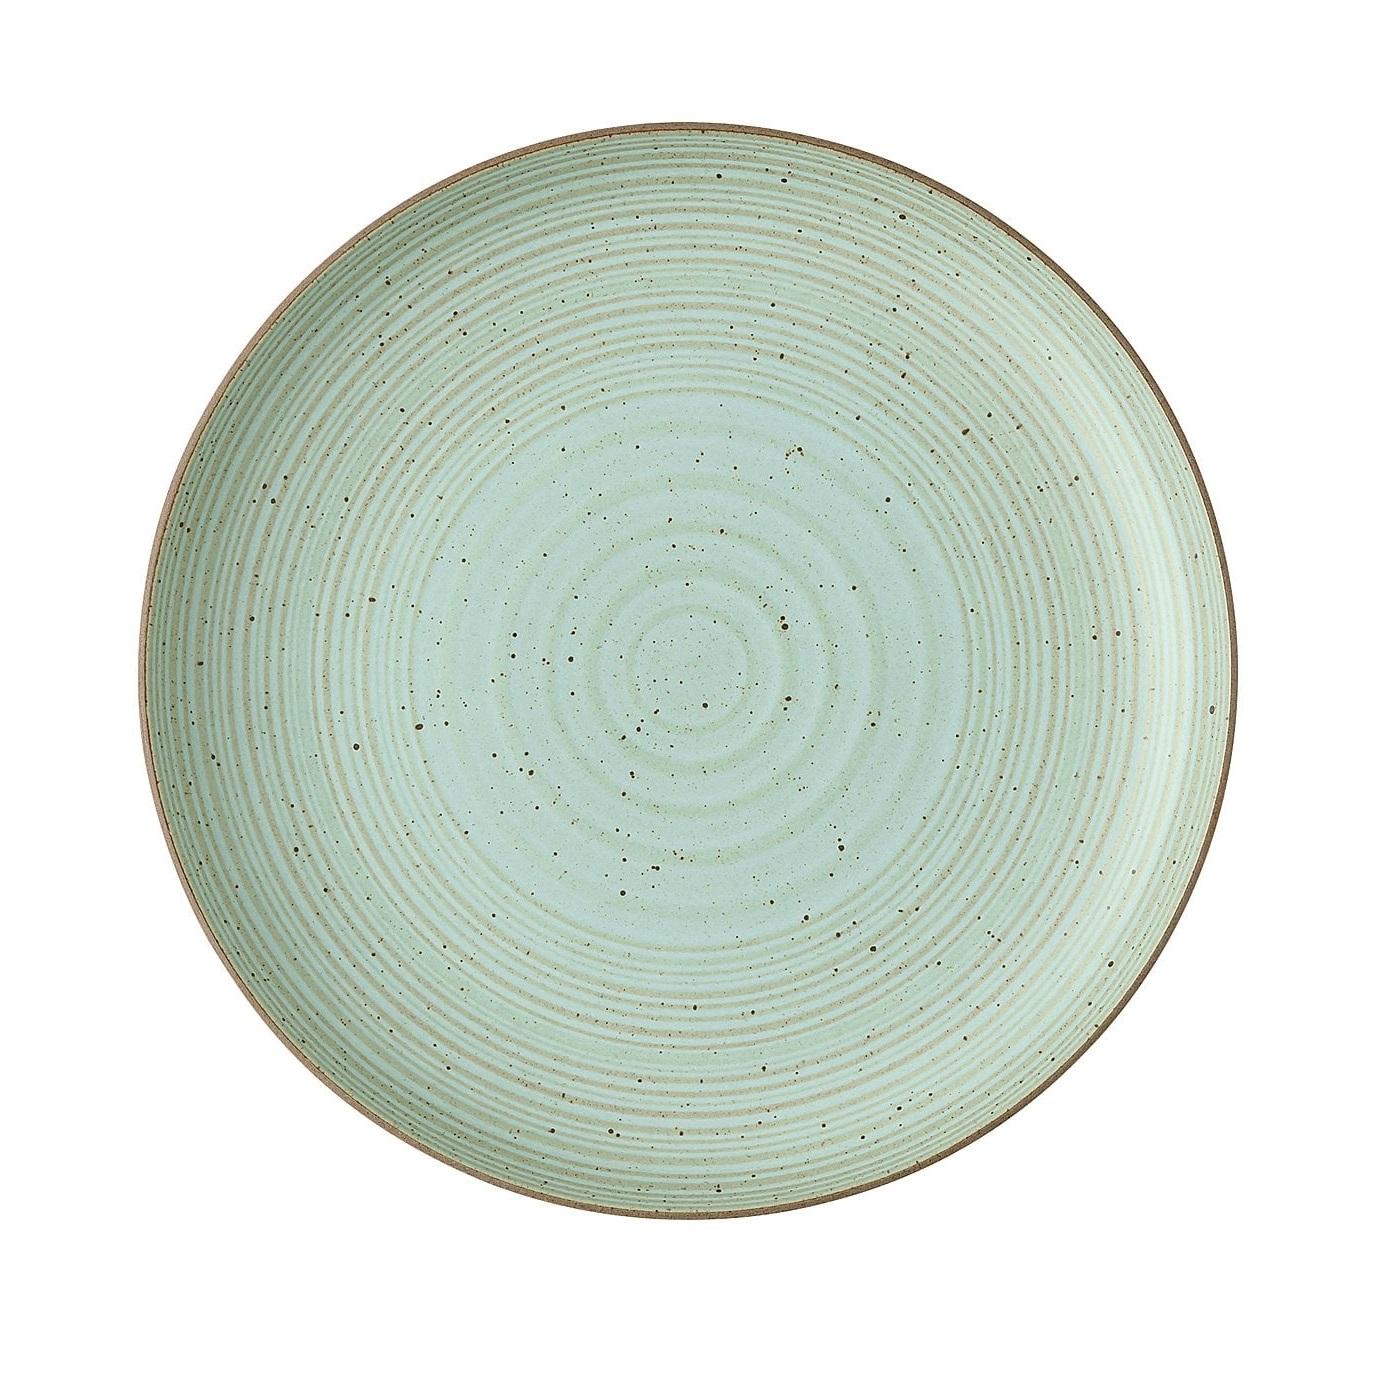 Онлайн каталог PROMENU: Тарелка обеденная керамическая Thomas Nature, диаметр 27 см, серый                               21730-227072-60227